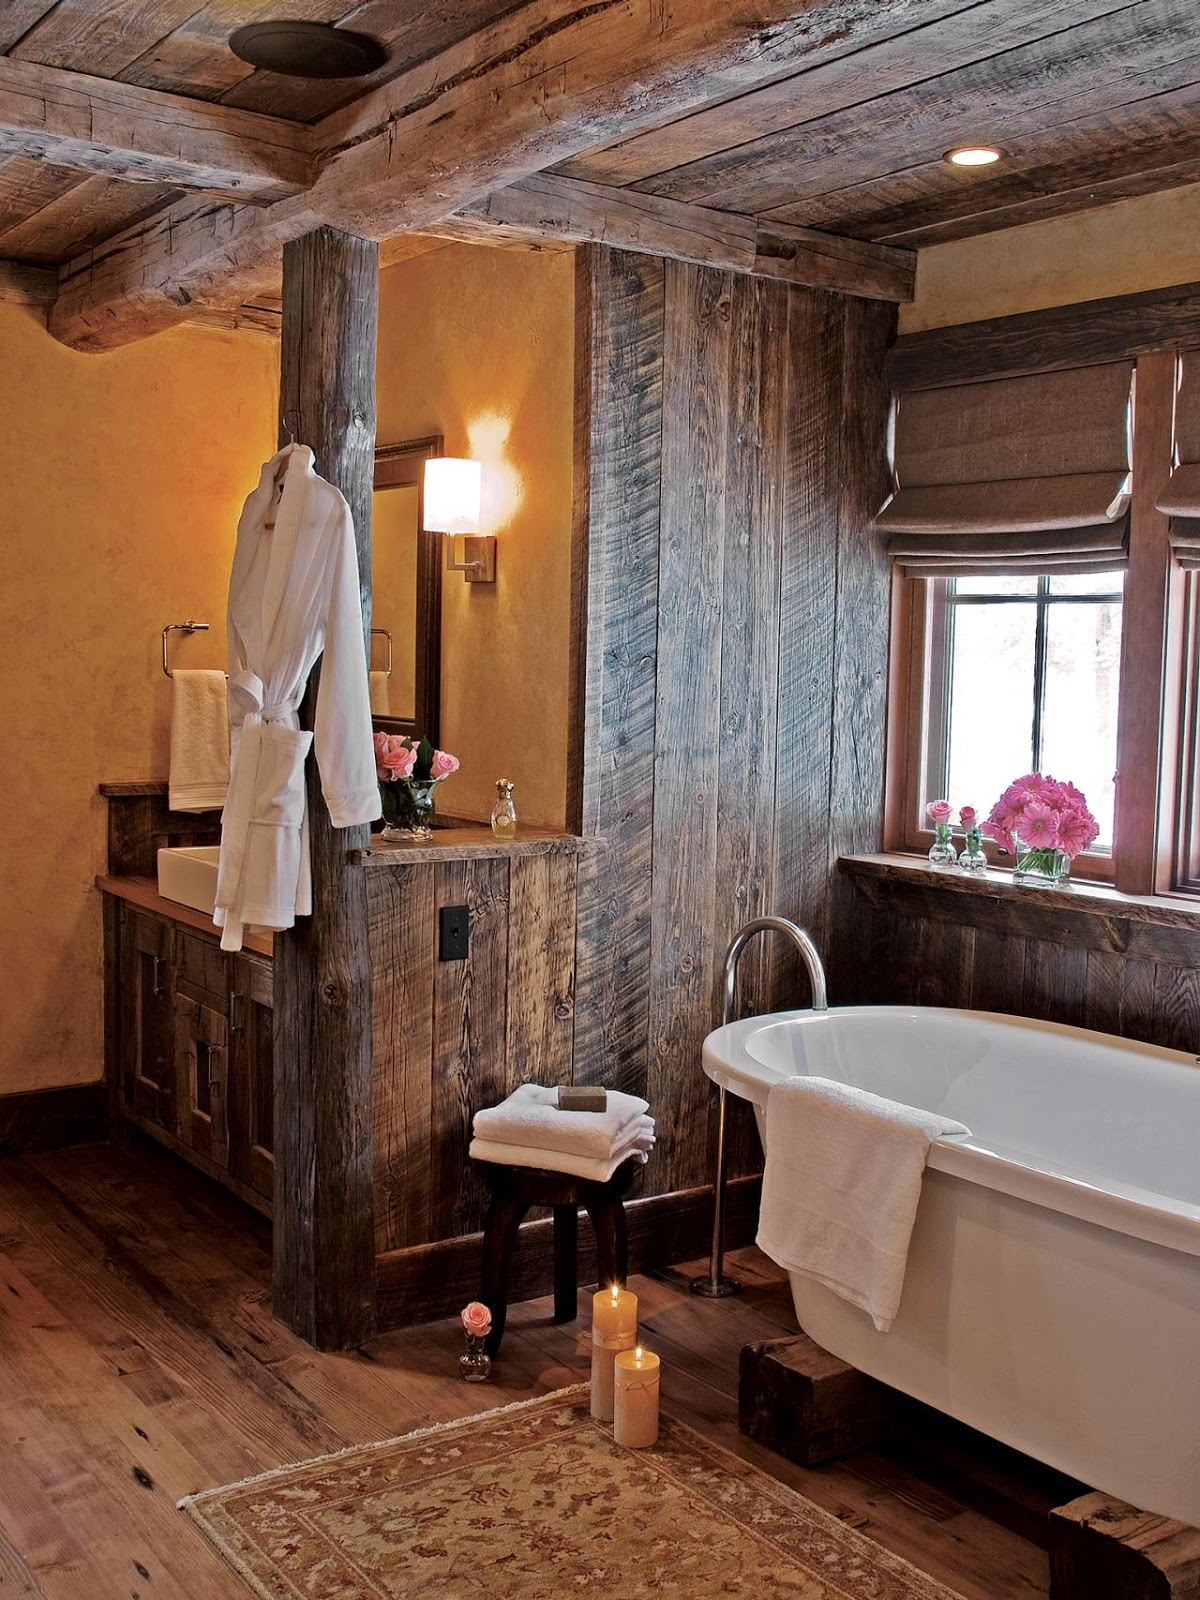 Decorunits.com%2BDecorating%2Bon%2Ba%2BBudget%2BDIY%2BRustic%2BBathroom%2BDecor%2BIdeas%2Bto%2BTry%2Bat%2BHome%2B%25281%2529 25 Decorating on a Budget DIY Rustic Bathroom Decor Ideas to Try at Home Interior